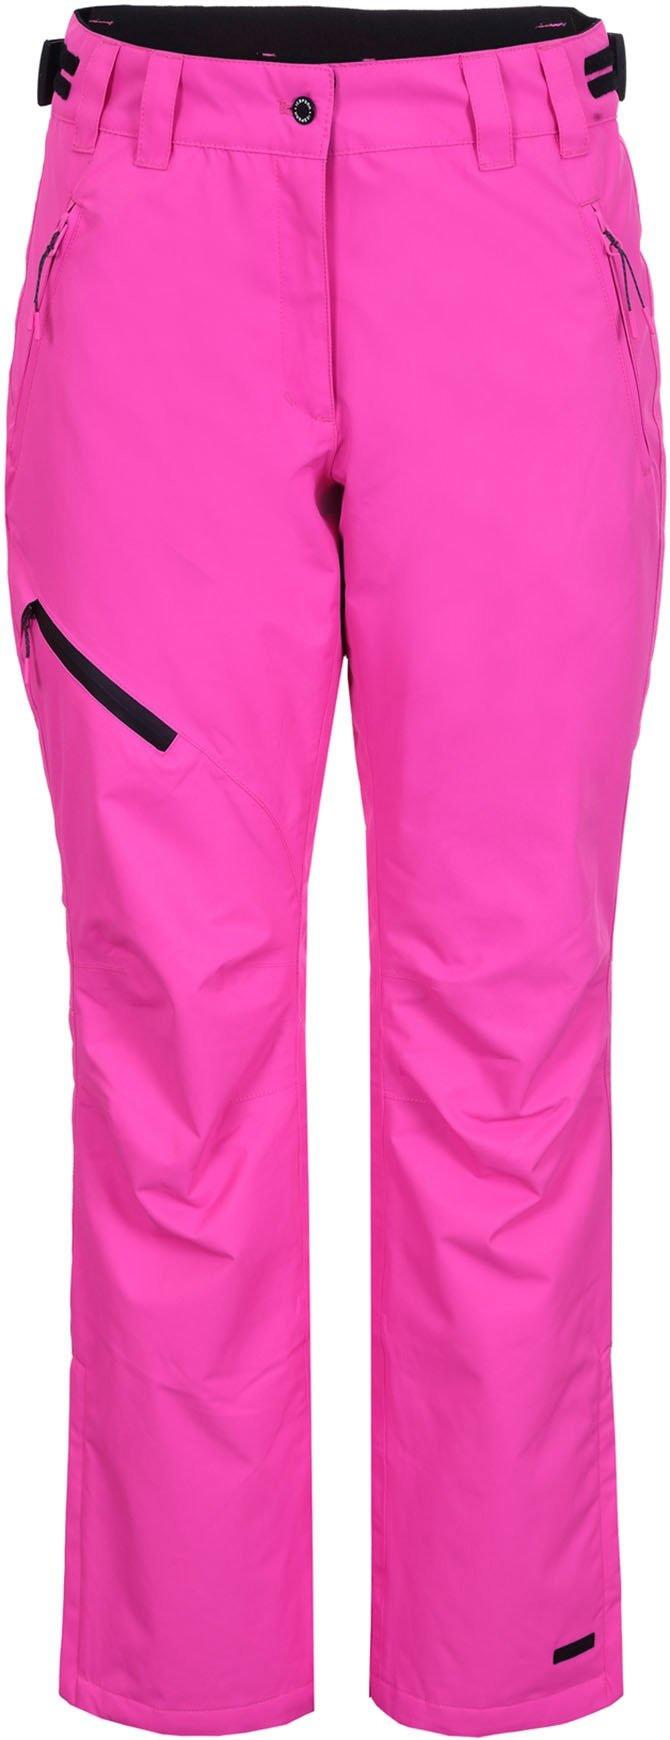 Dámské lyžařské kalhoty Icepeak  Josie Wadded Trousers